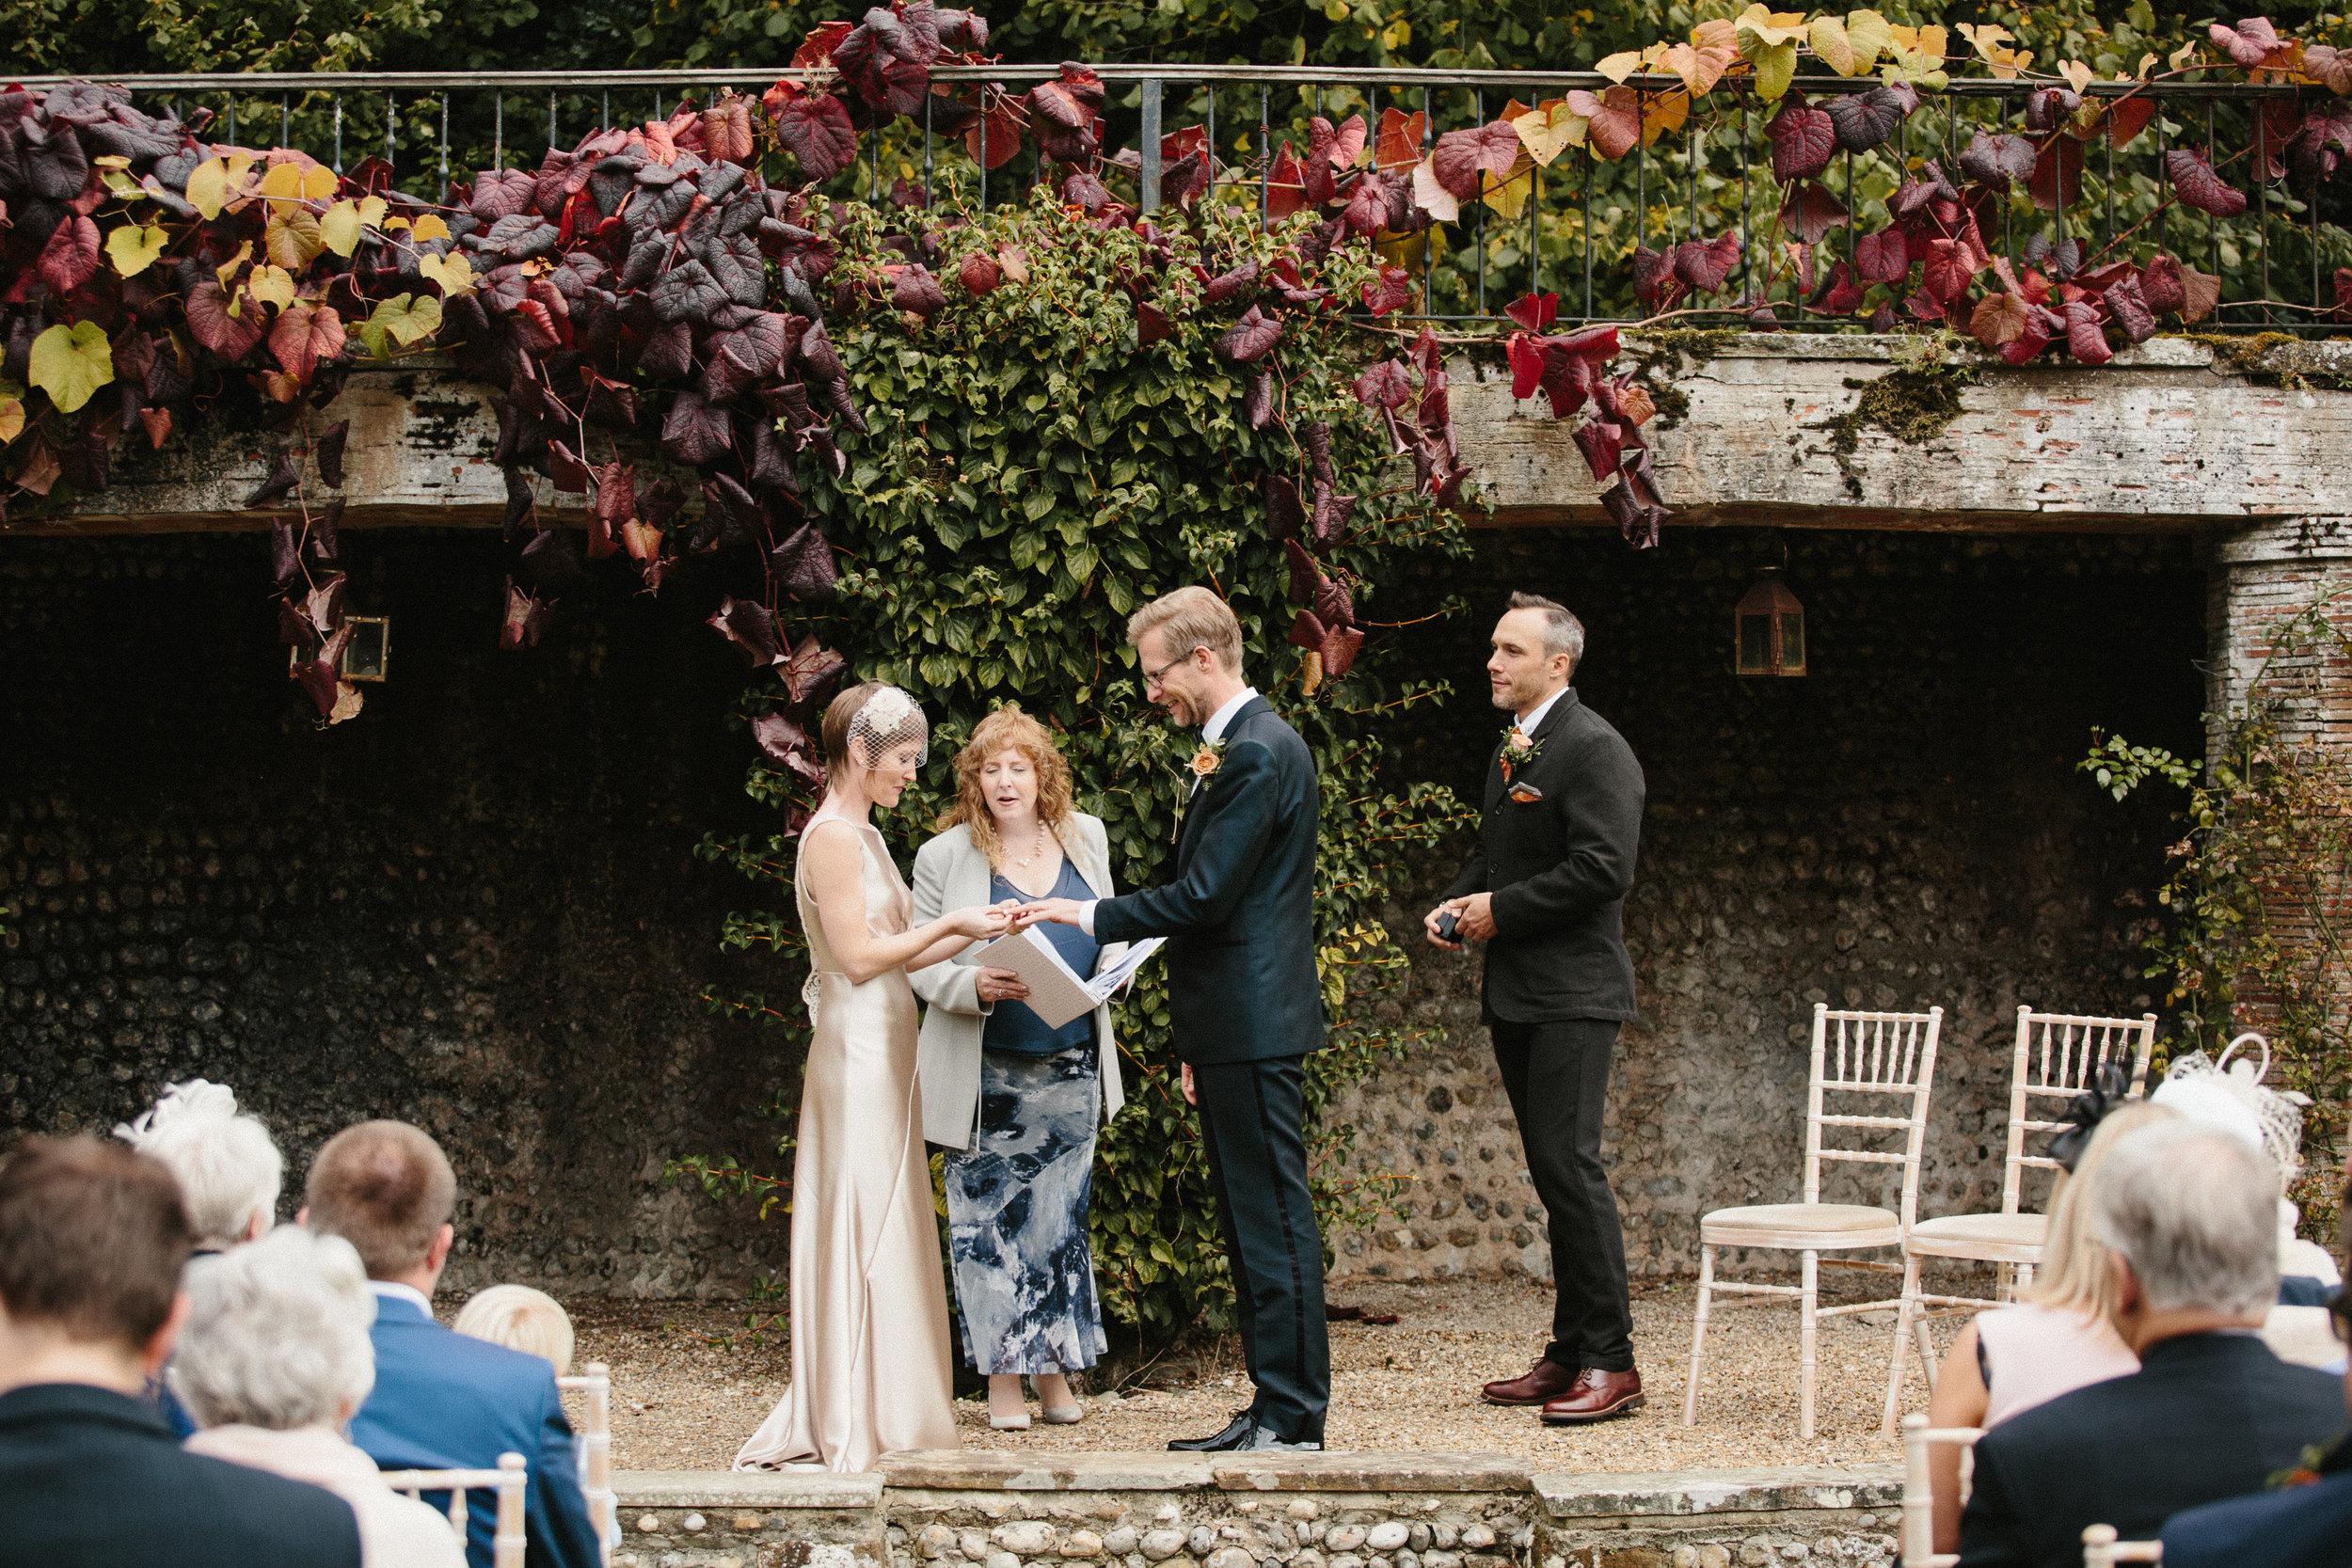 Kate-Beaumont-Sheffield-Honeysuckle-bias-cut-wedding-dress-oyster-Rosie10.jpg